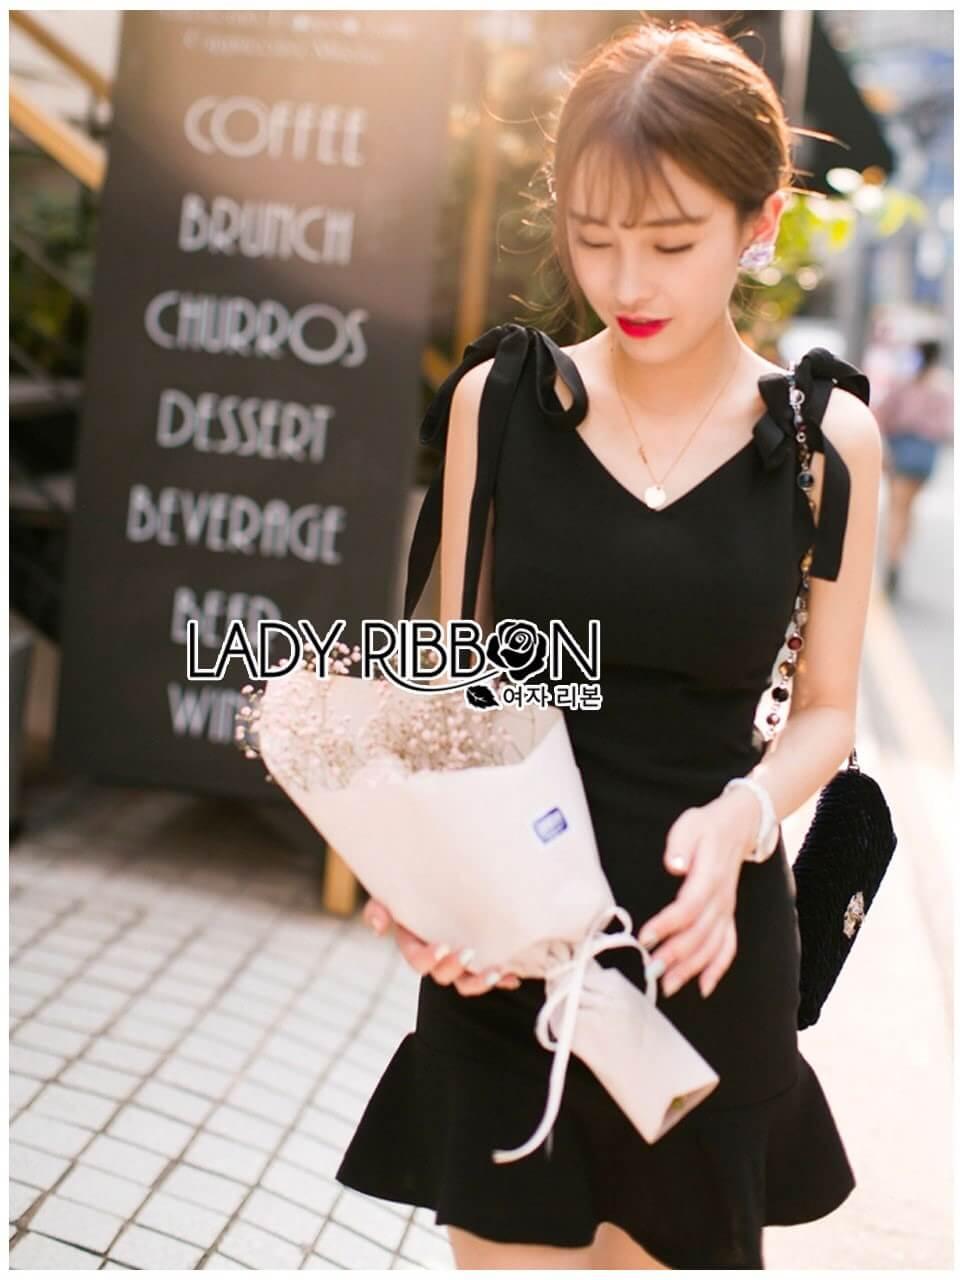 &#x1F380 Lady Ribbon's Made &#x1F380 Lady Eva Sweet and Sexy Ribbon Cocktail Dress